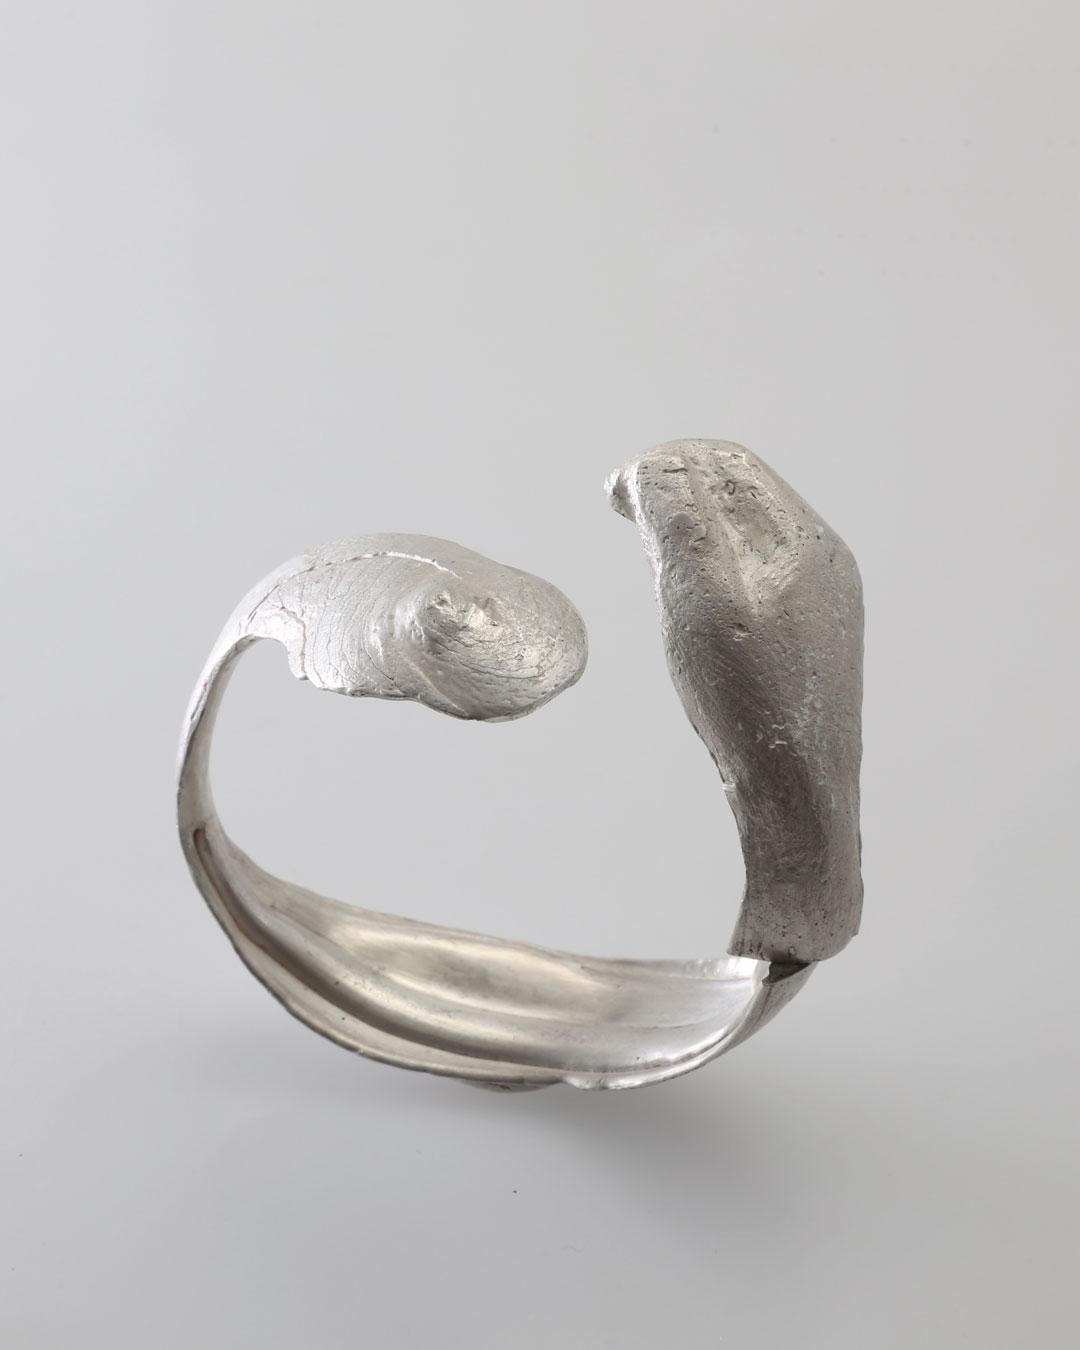 Juliane Brandes, zonder titel, 2016, armband; zilver, 60 x 70 x 30 mm, €2430